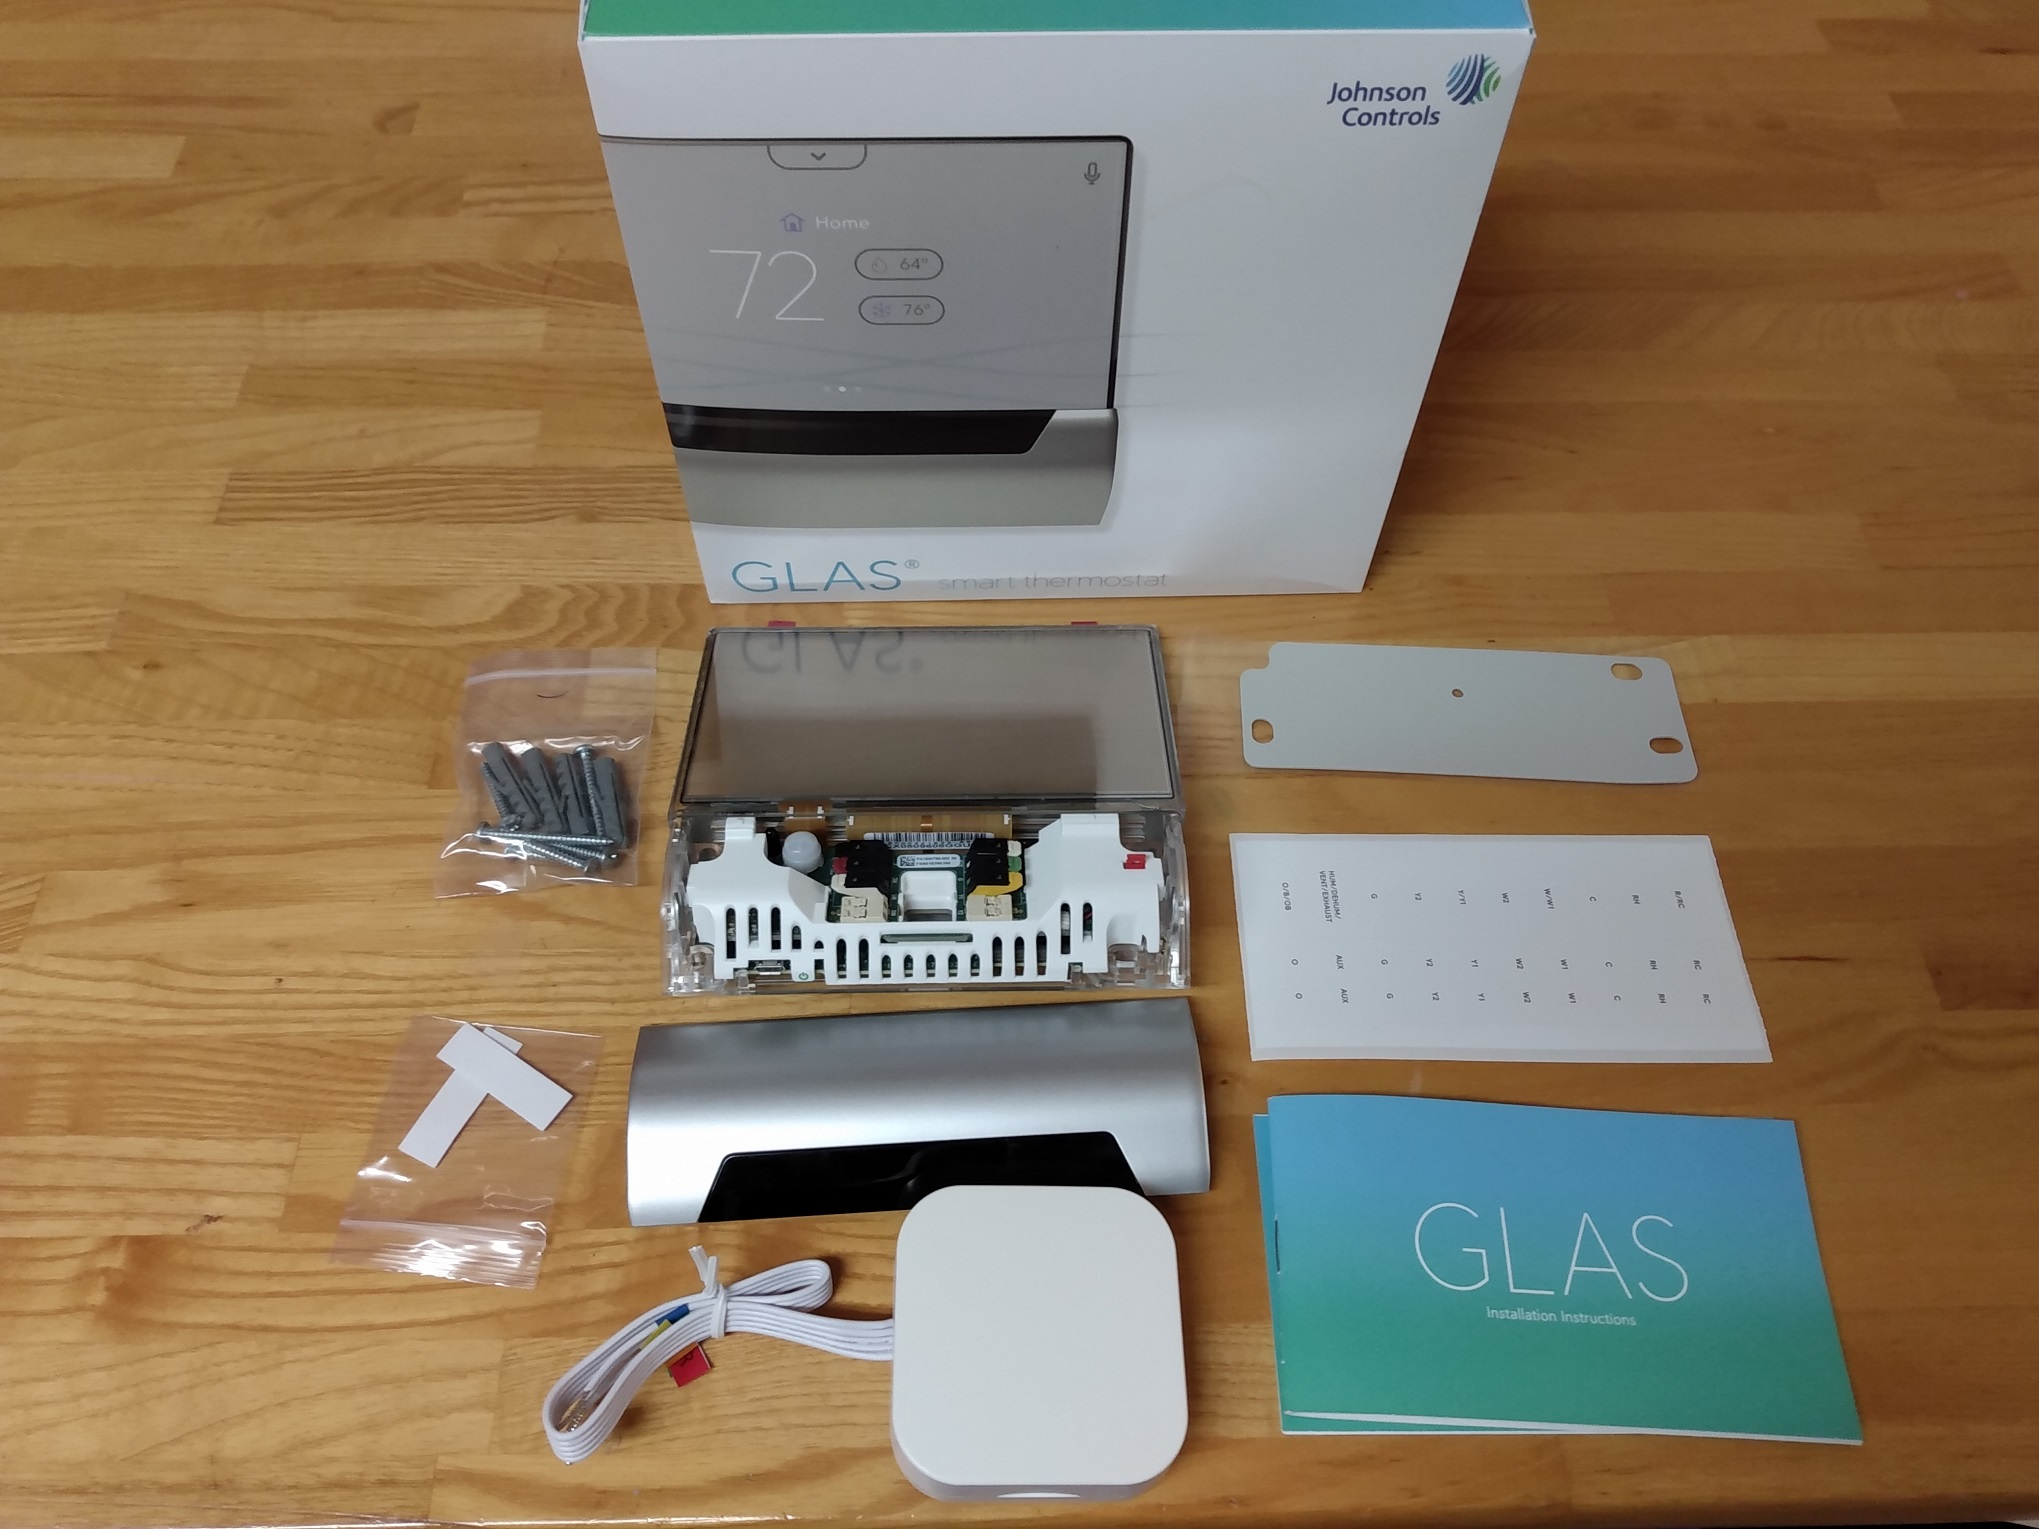 GLAS unbox